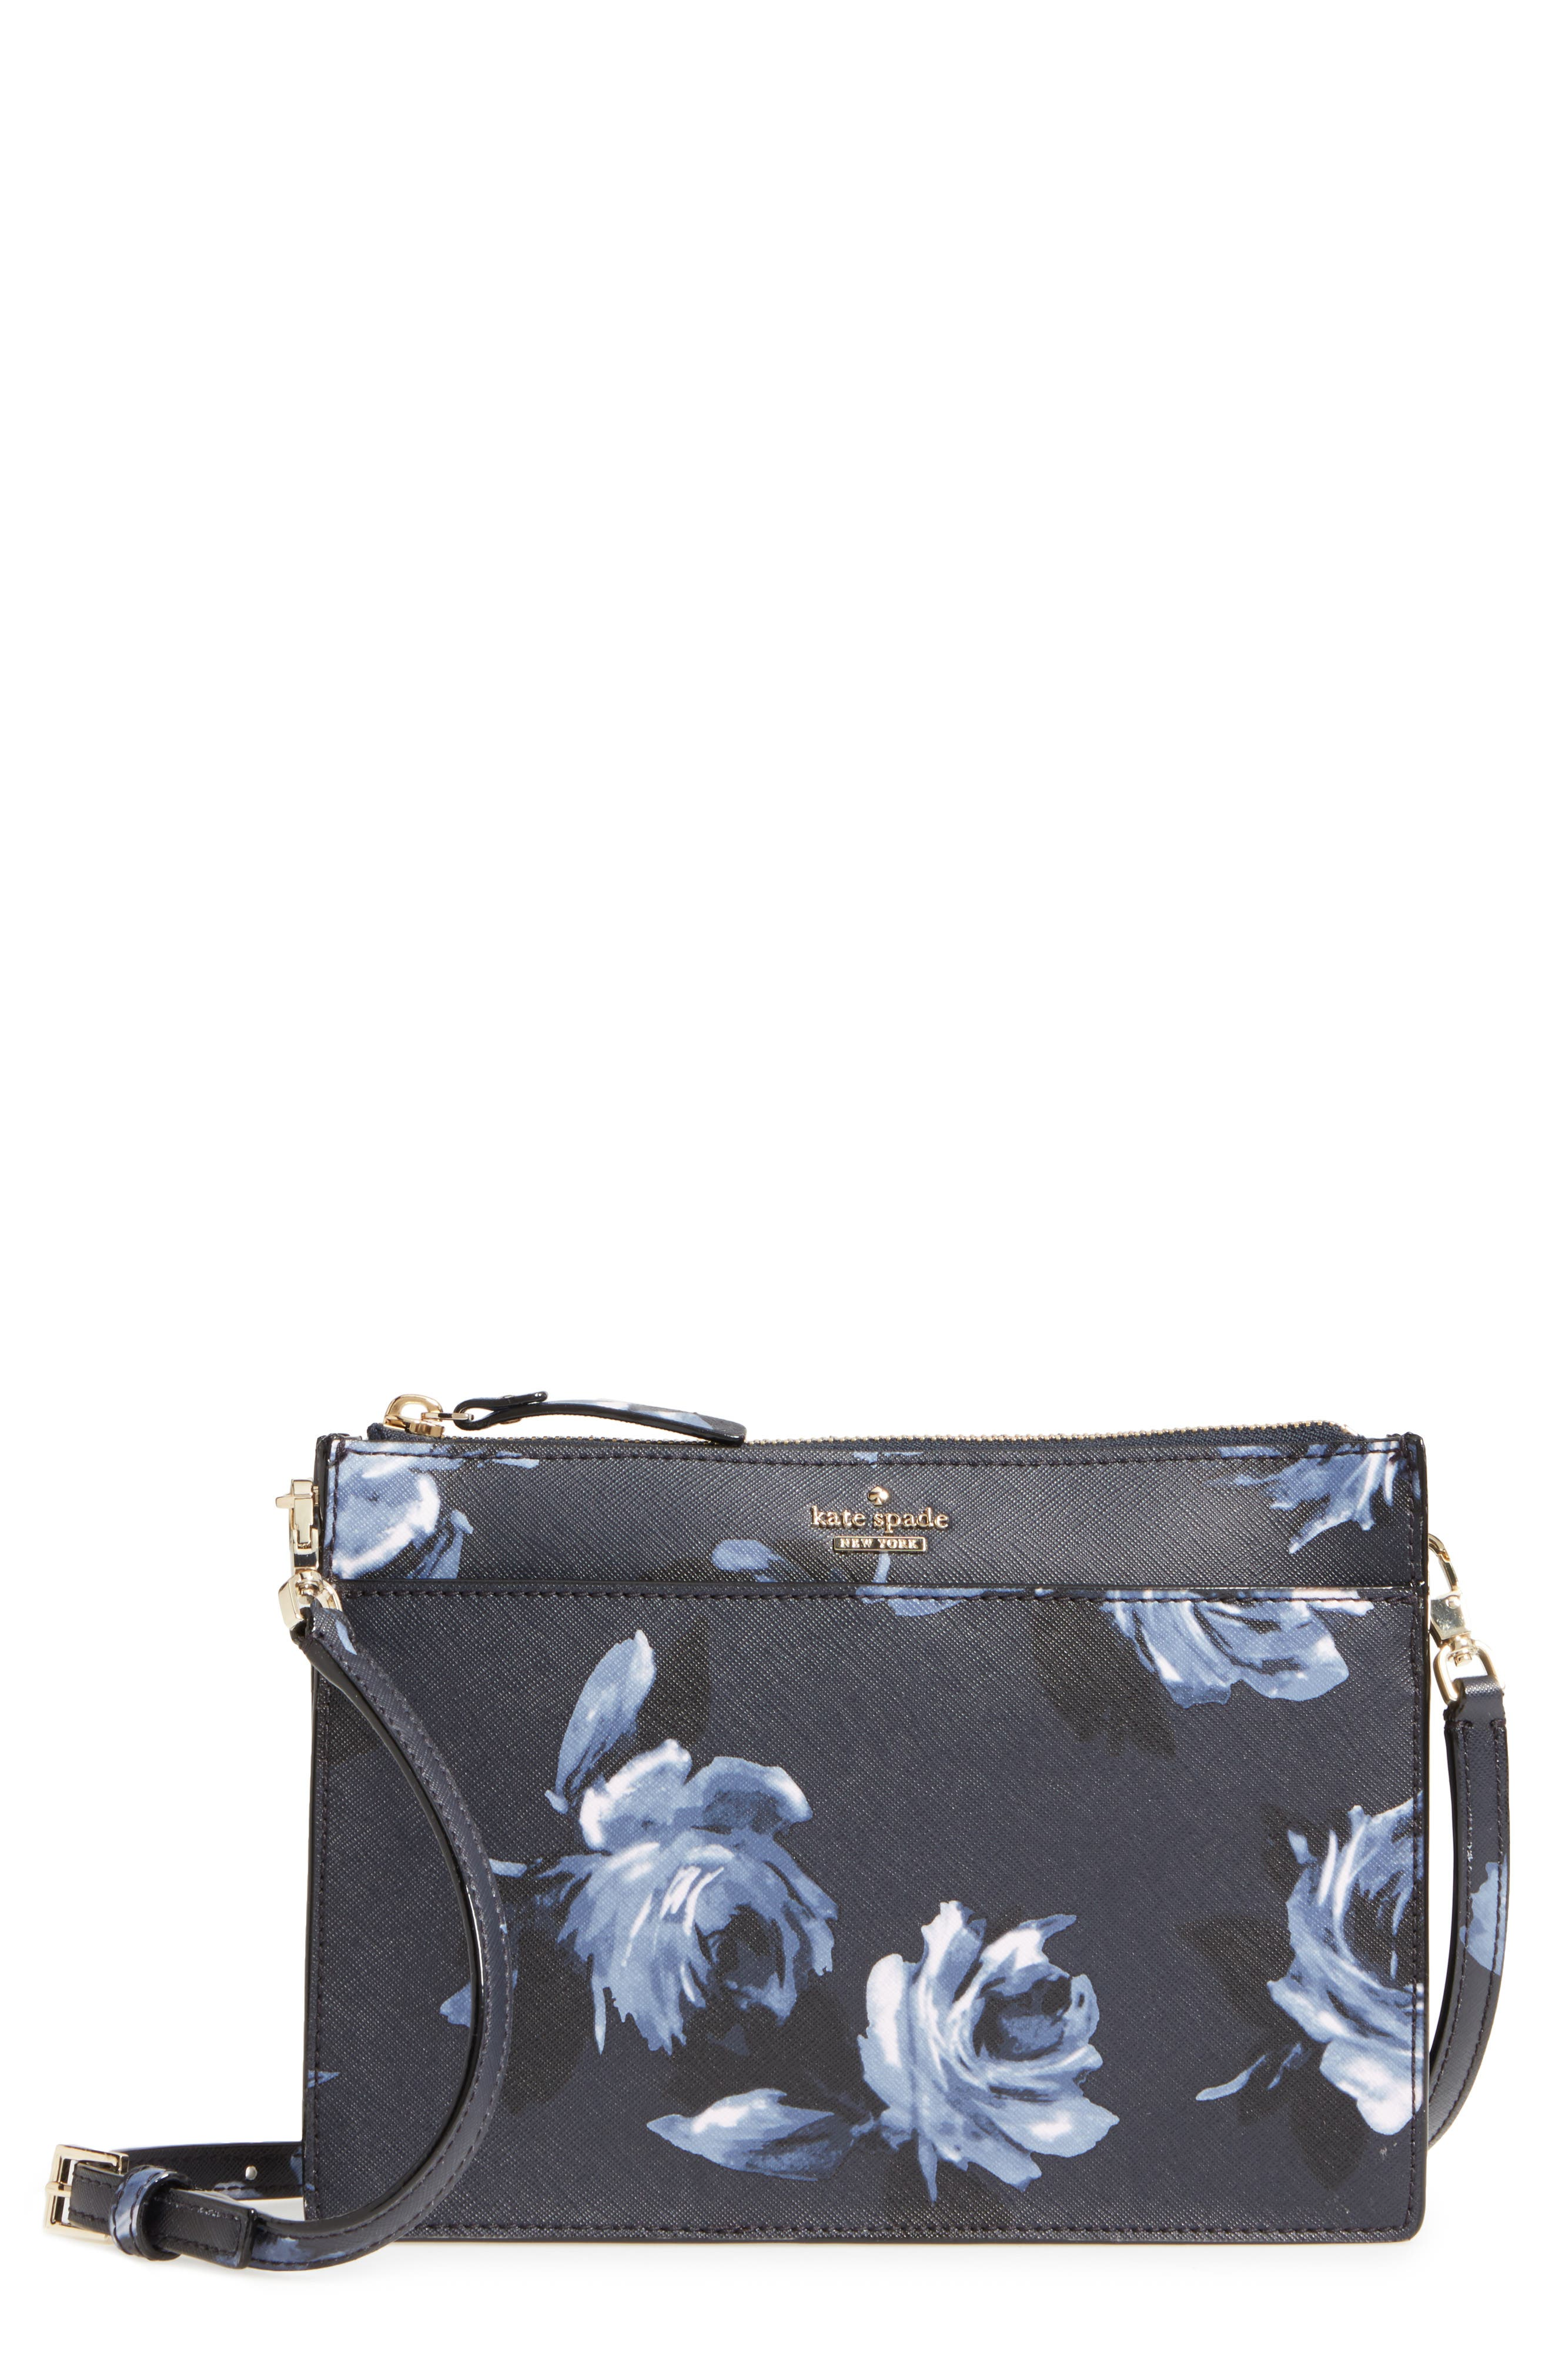 Main Image - kate spade new york cameron street clarise leather shoulder bag